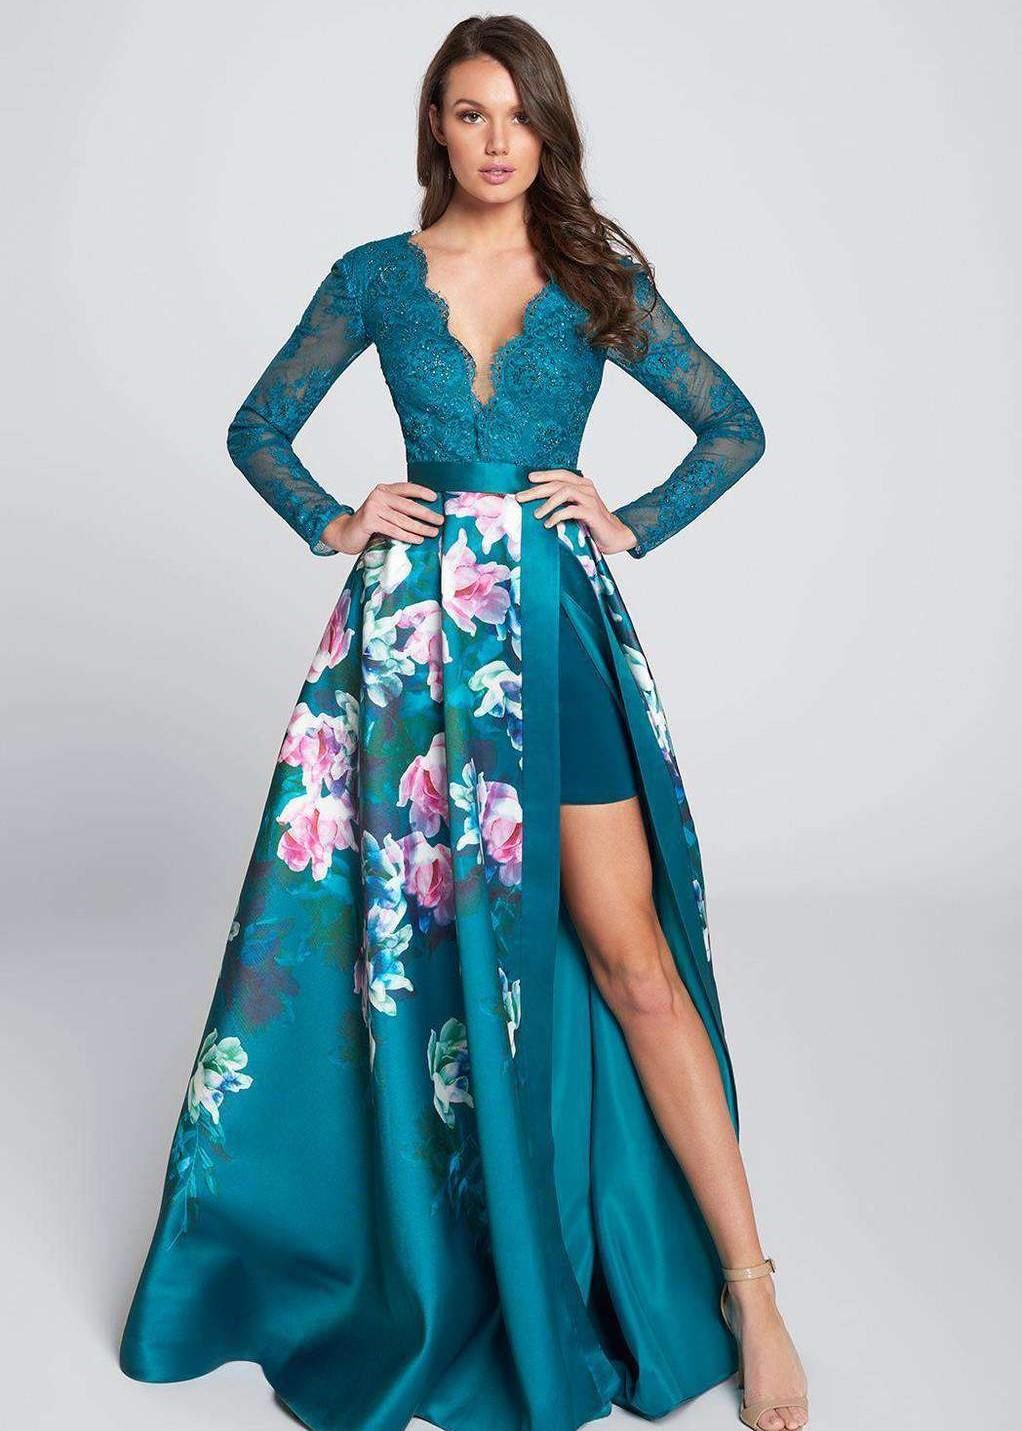 Ellie Wilde prom dress prima donna bridal EW21747